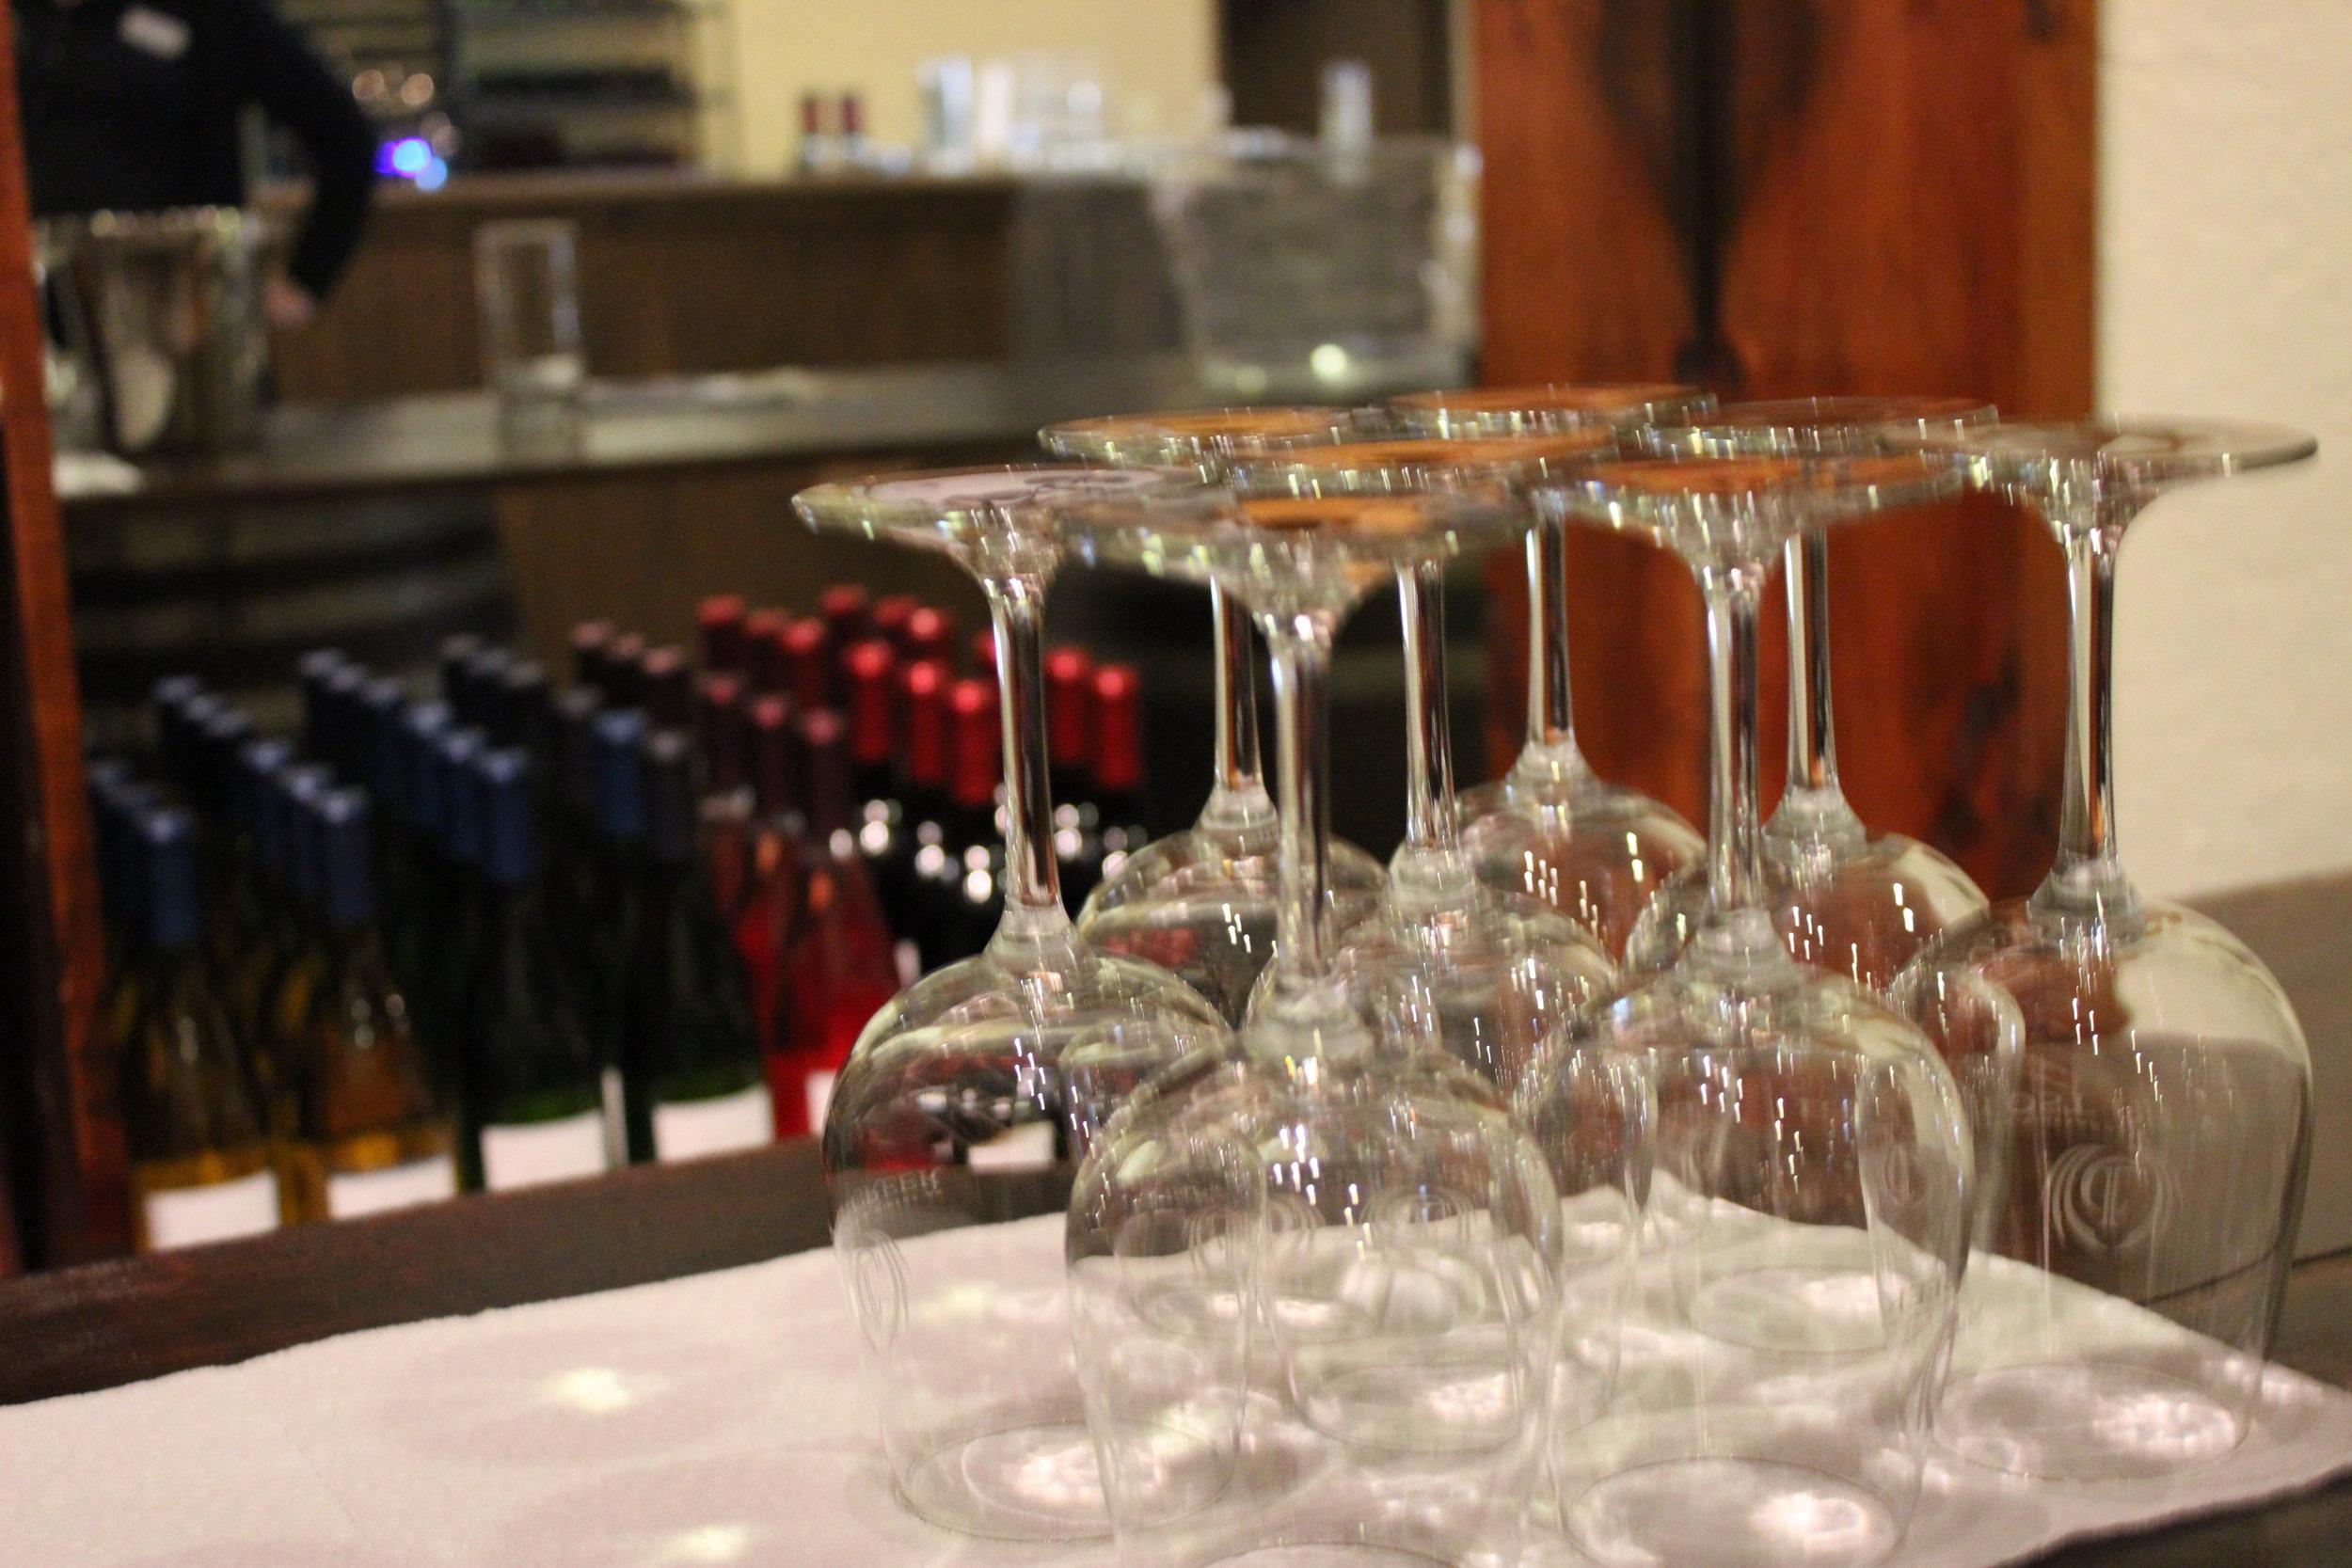 Lost Creek Vineyard and Winery